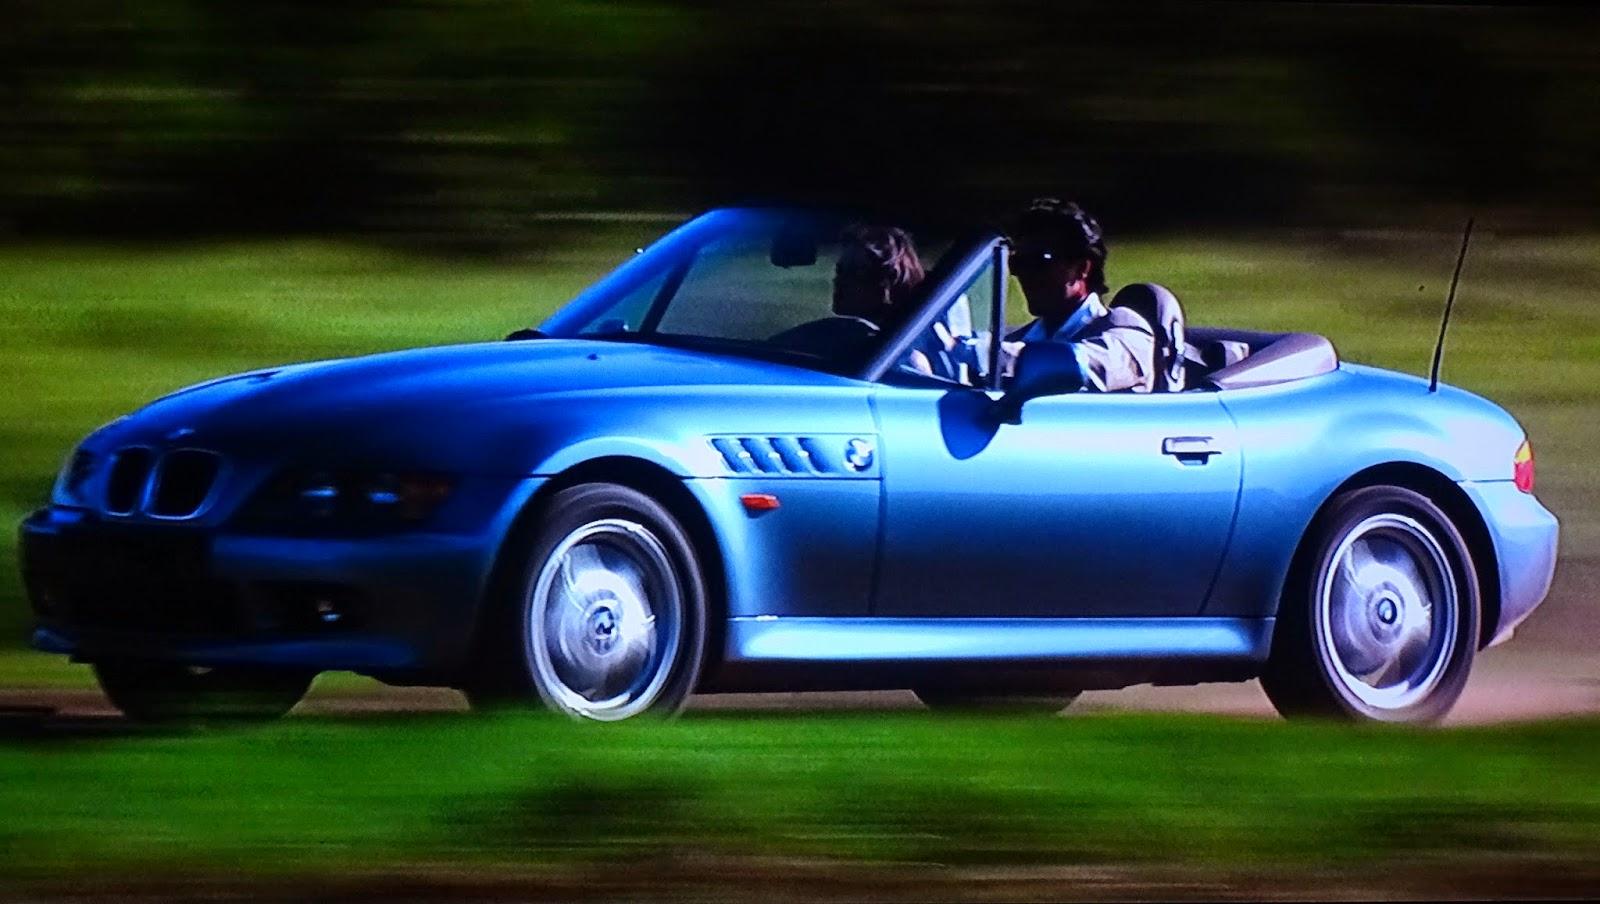 007 Travelers 007 Vehicle Bmw Z3 Goldeneye 1995